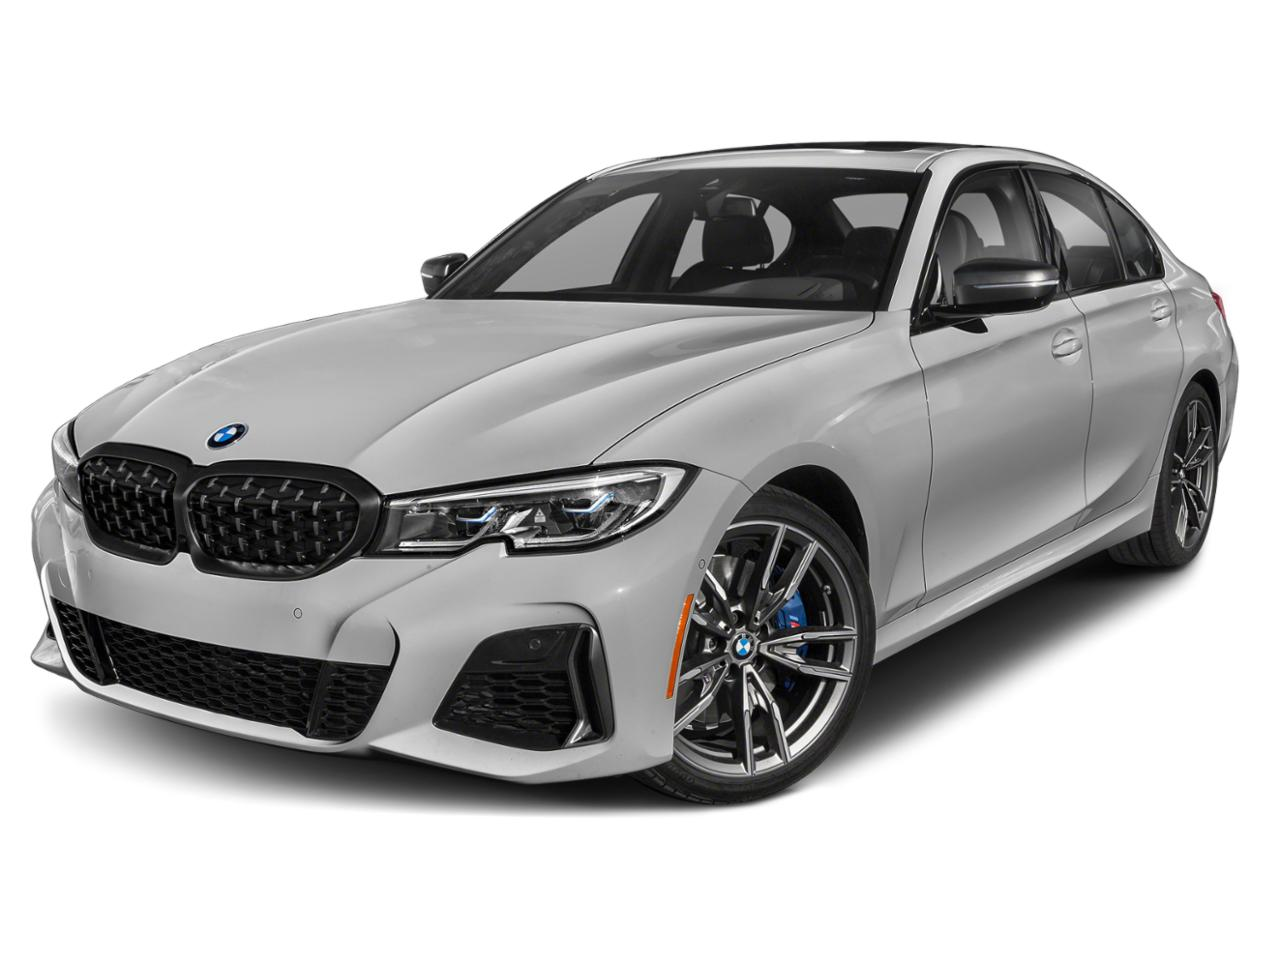 2020 BMW M340i Vehicle Photo in Grapevine, TX 76051